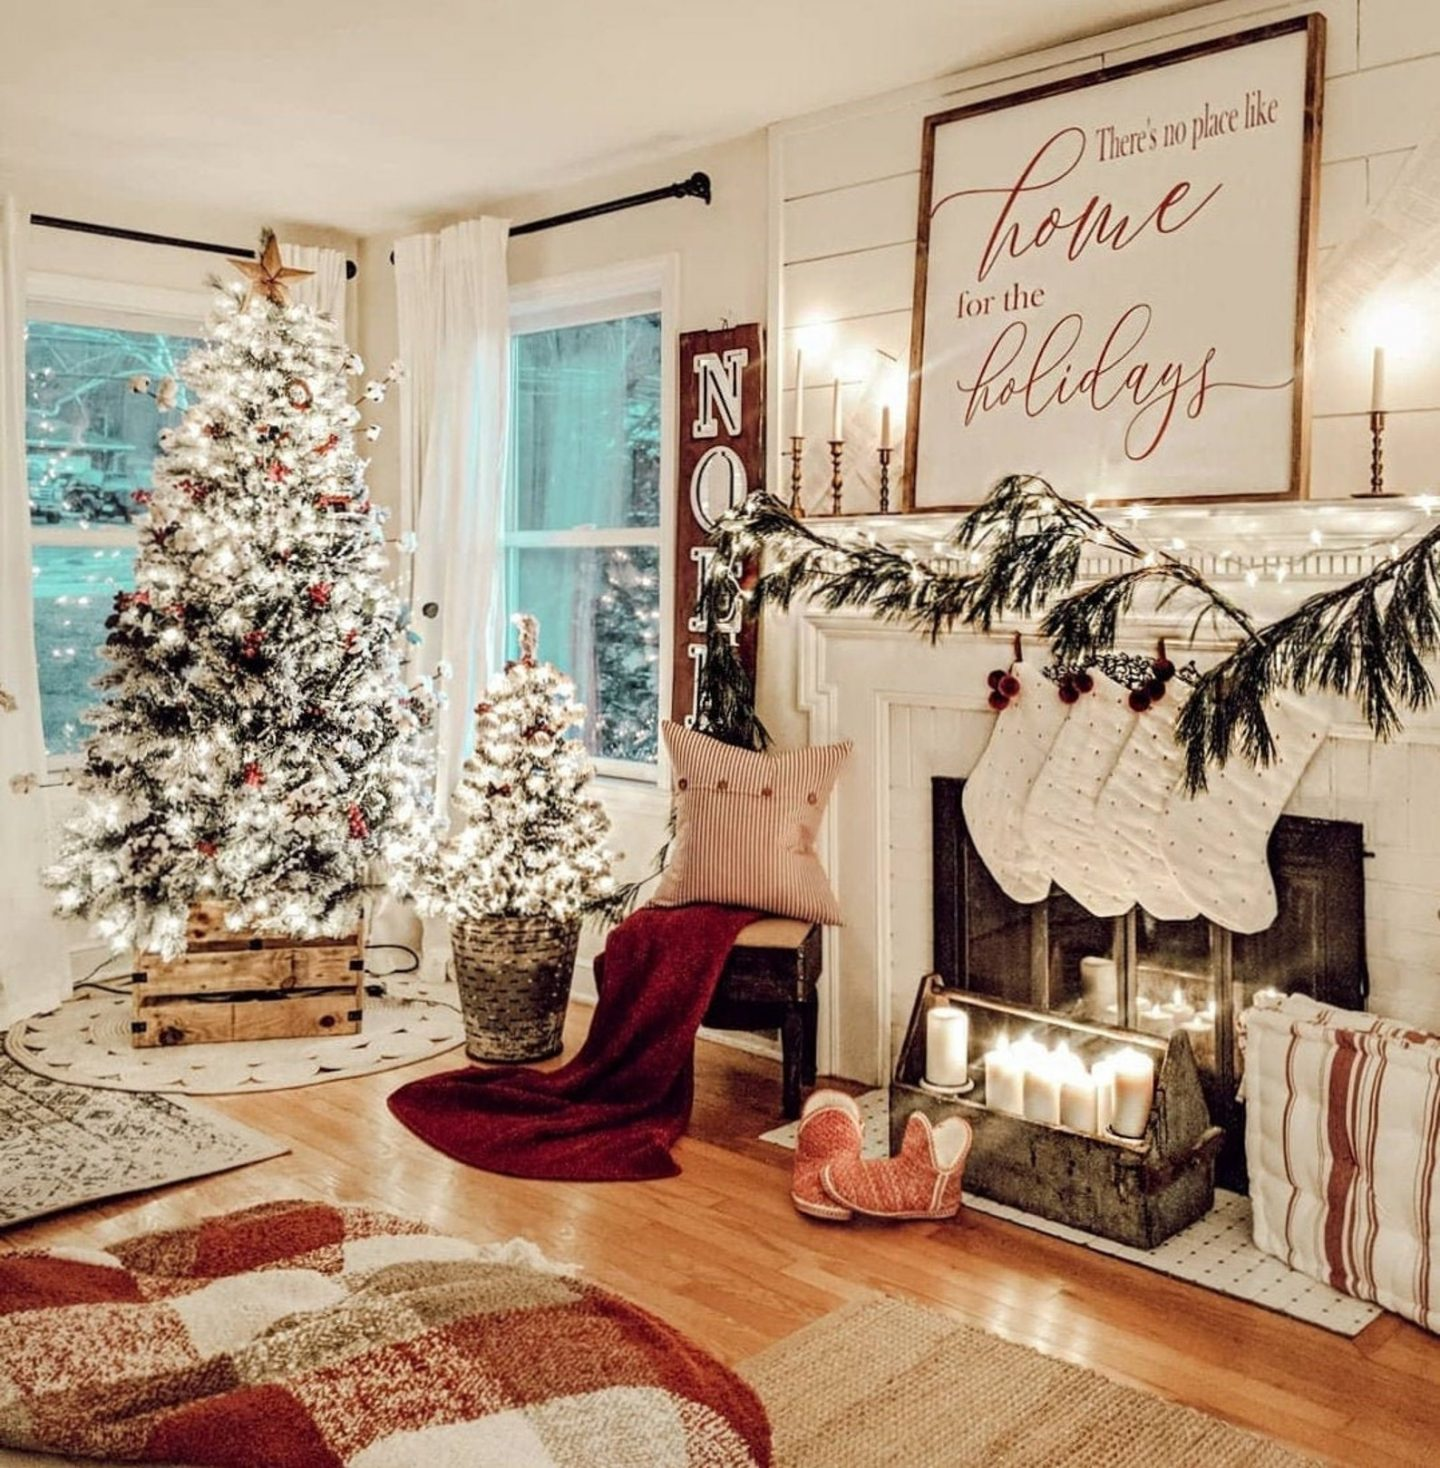 Beautiful Christmas mantel decor with sign